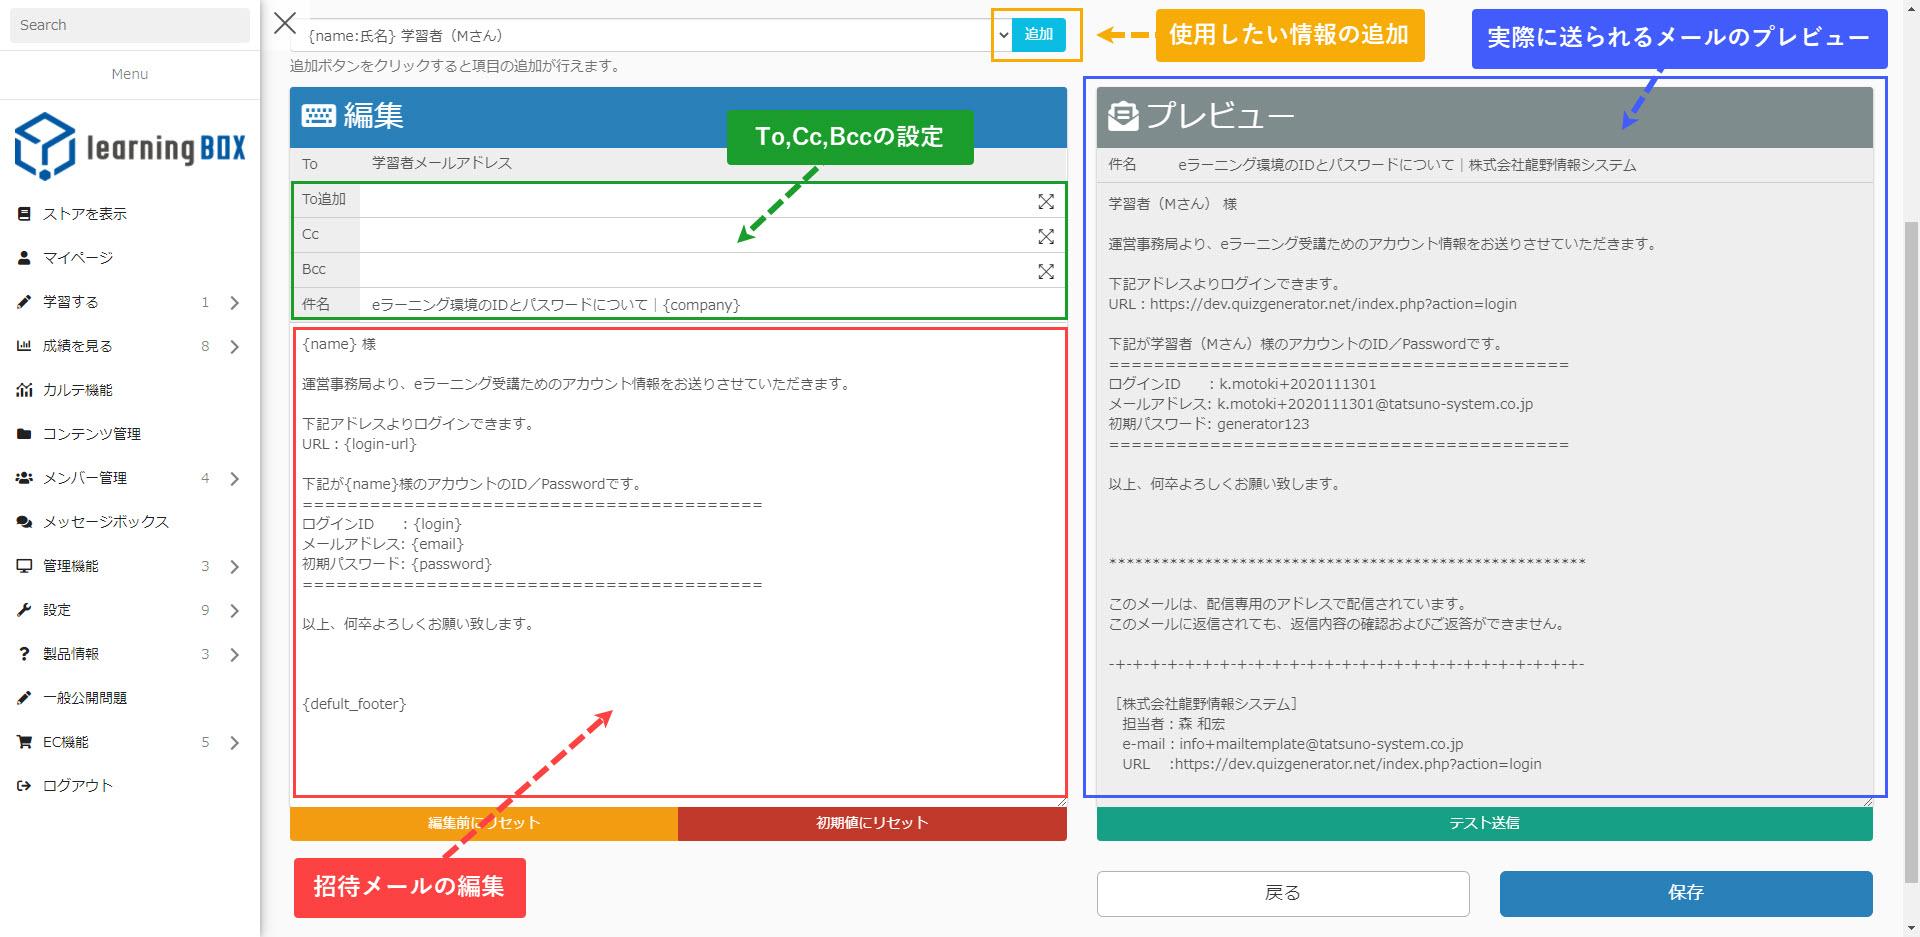 learningBOX-メールテンプレートの編集